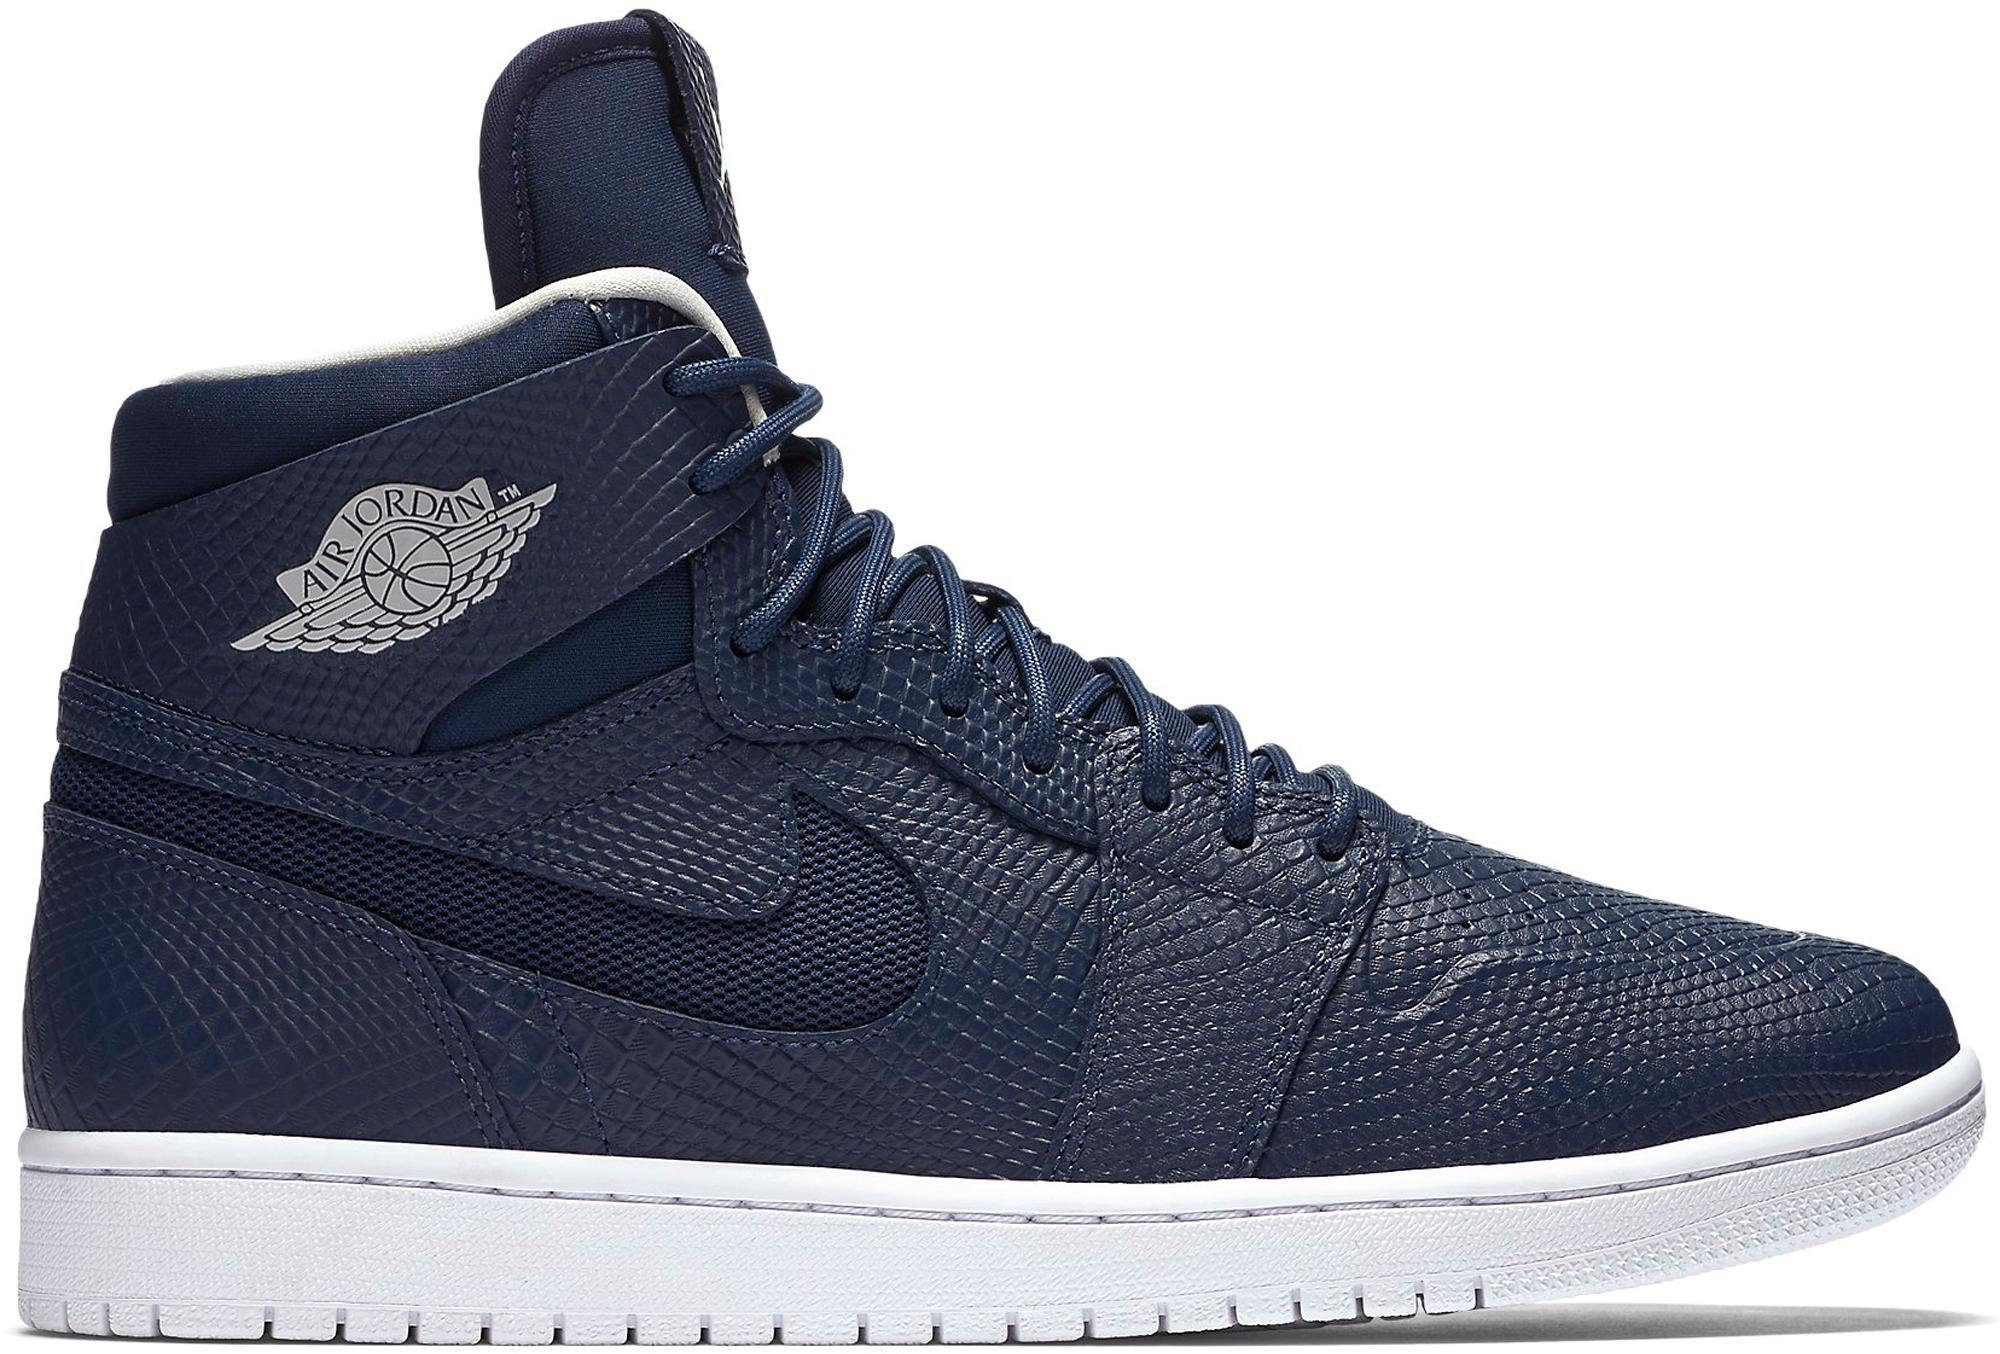 finest selection 37941 b3a05 Nike - Blue 1 Retro Nouveau Navy Snake for Men - Lyst. View fullscreen